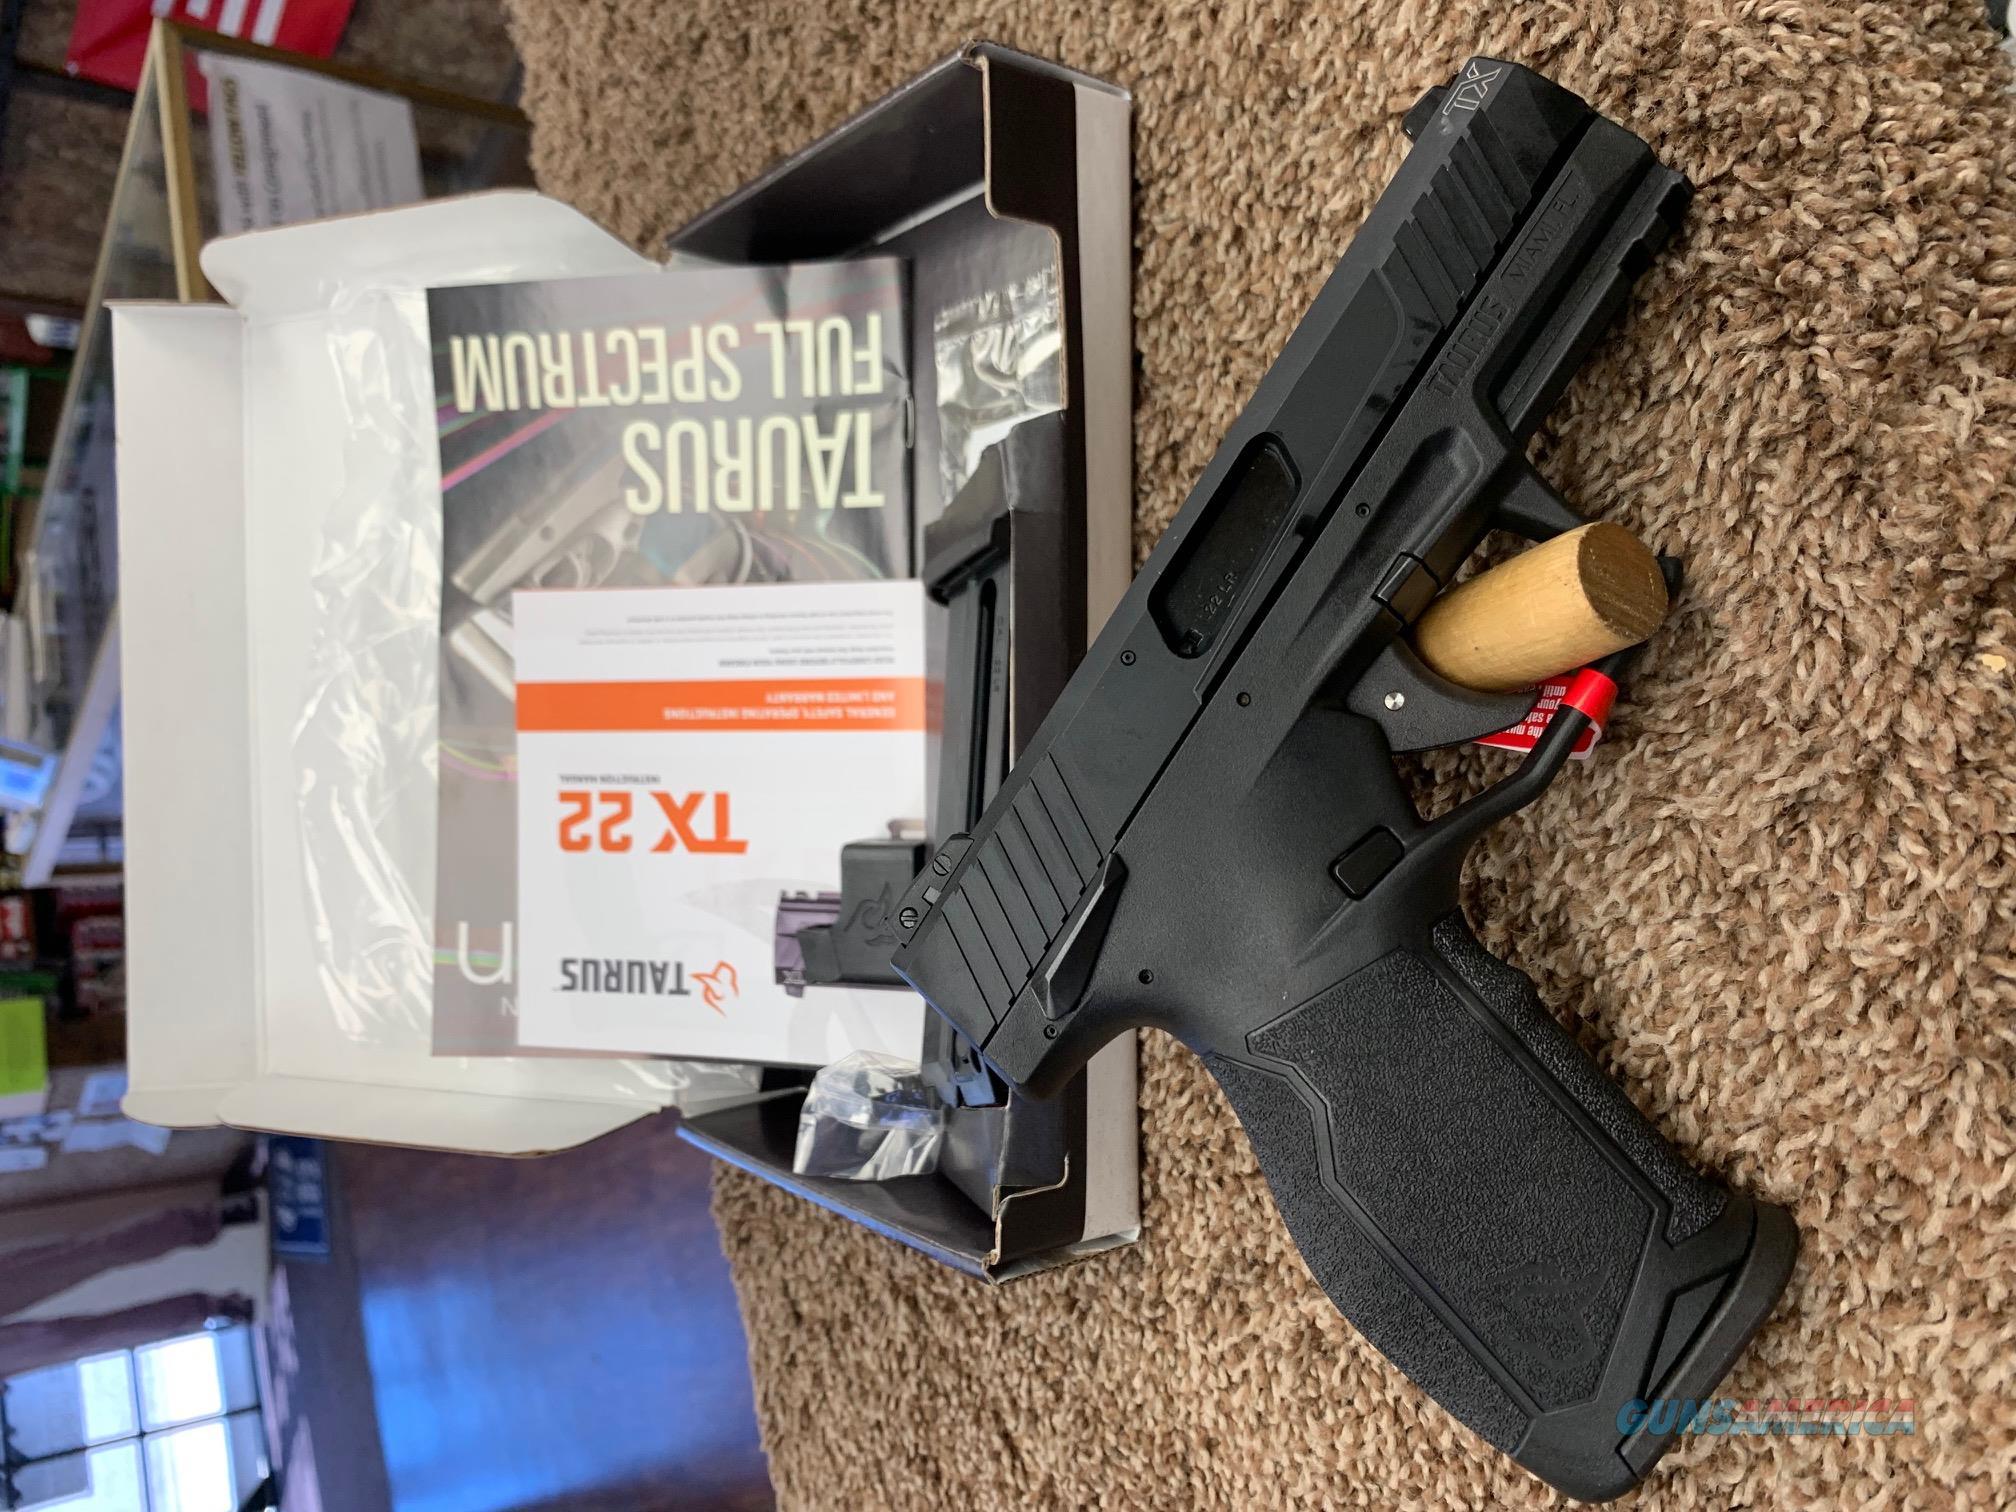 Taurus TX22 22 LR plus $50 rebate  Guns > Pistols > Taurus Pistols > Semi Auto Pistols > Polymer Frame